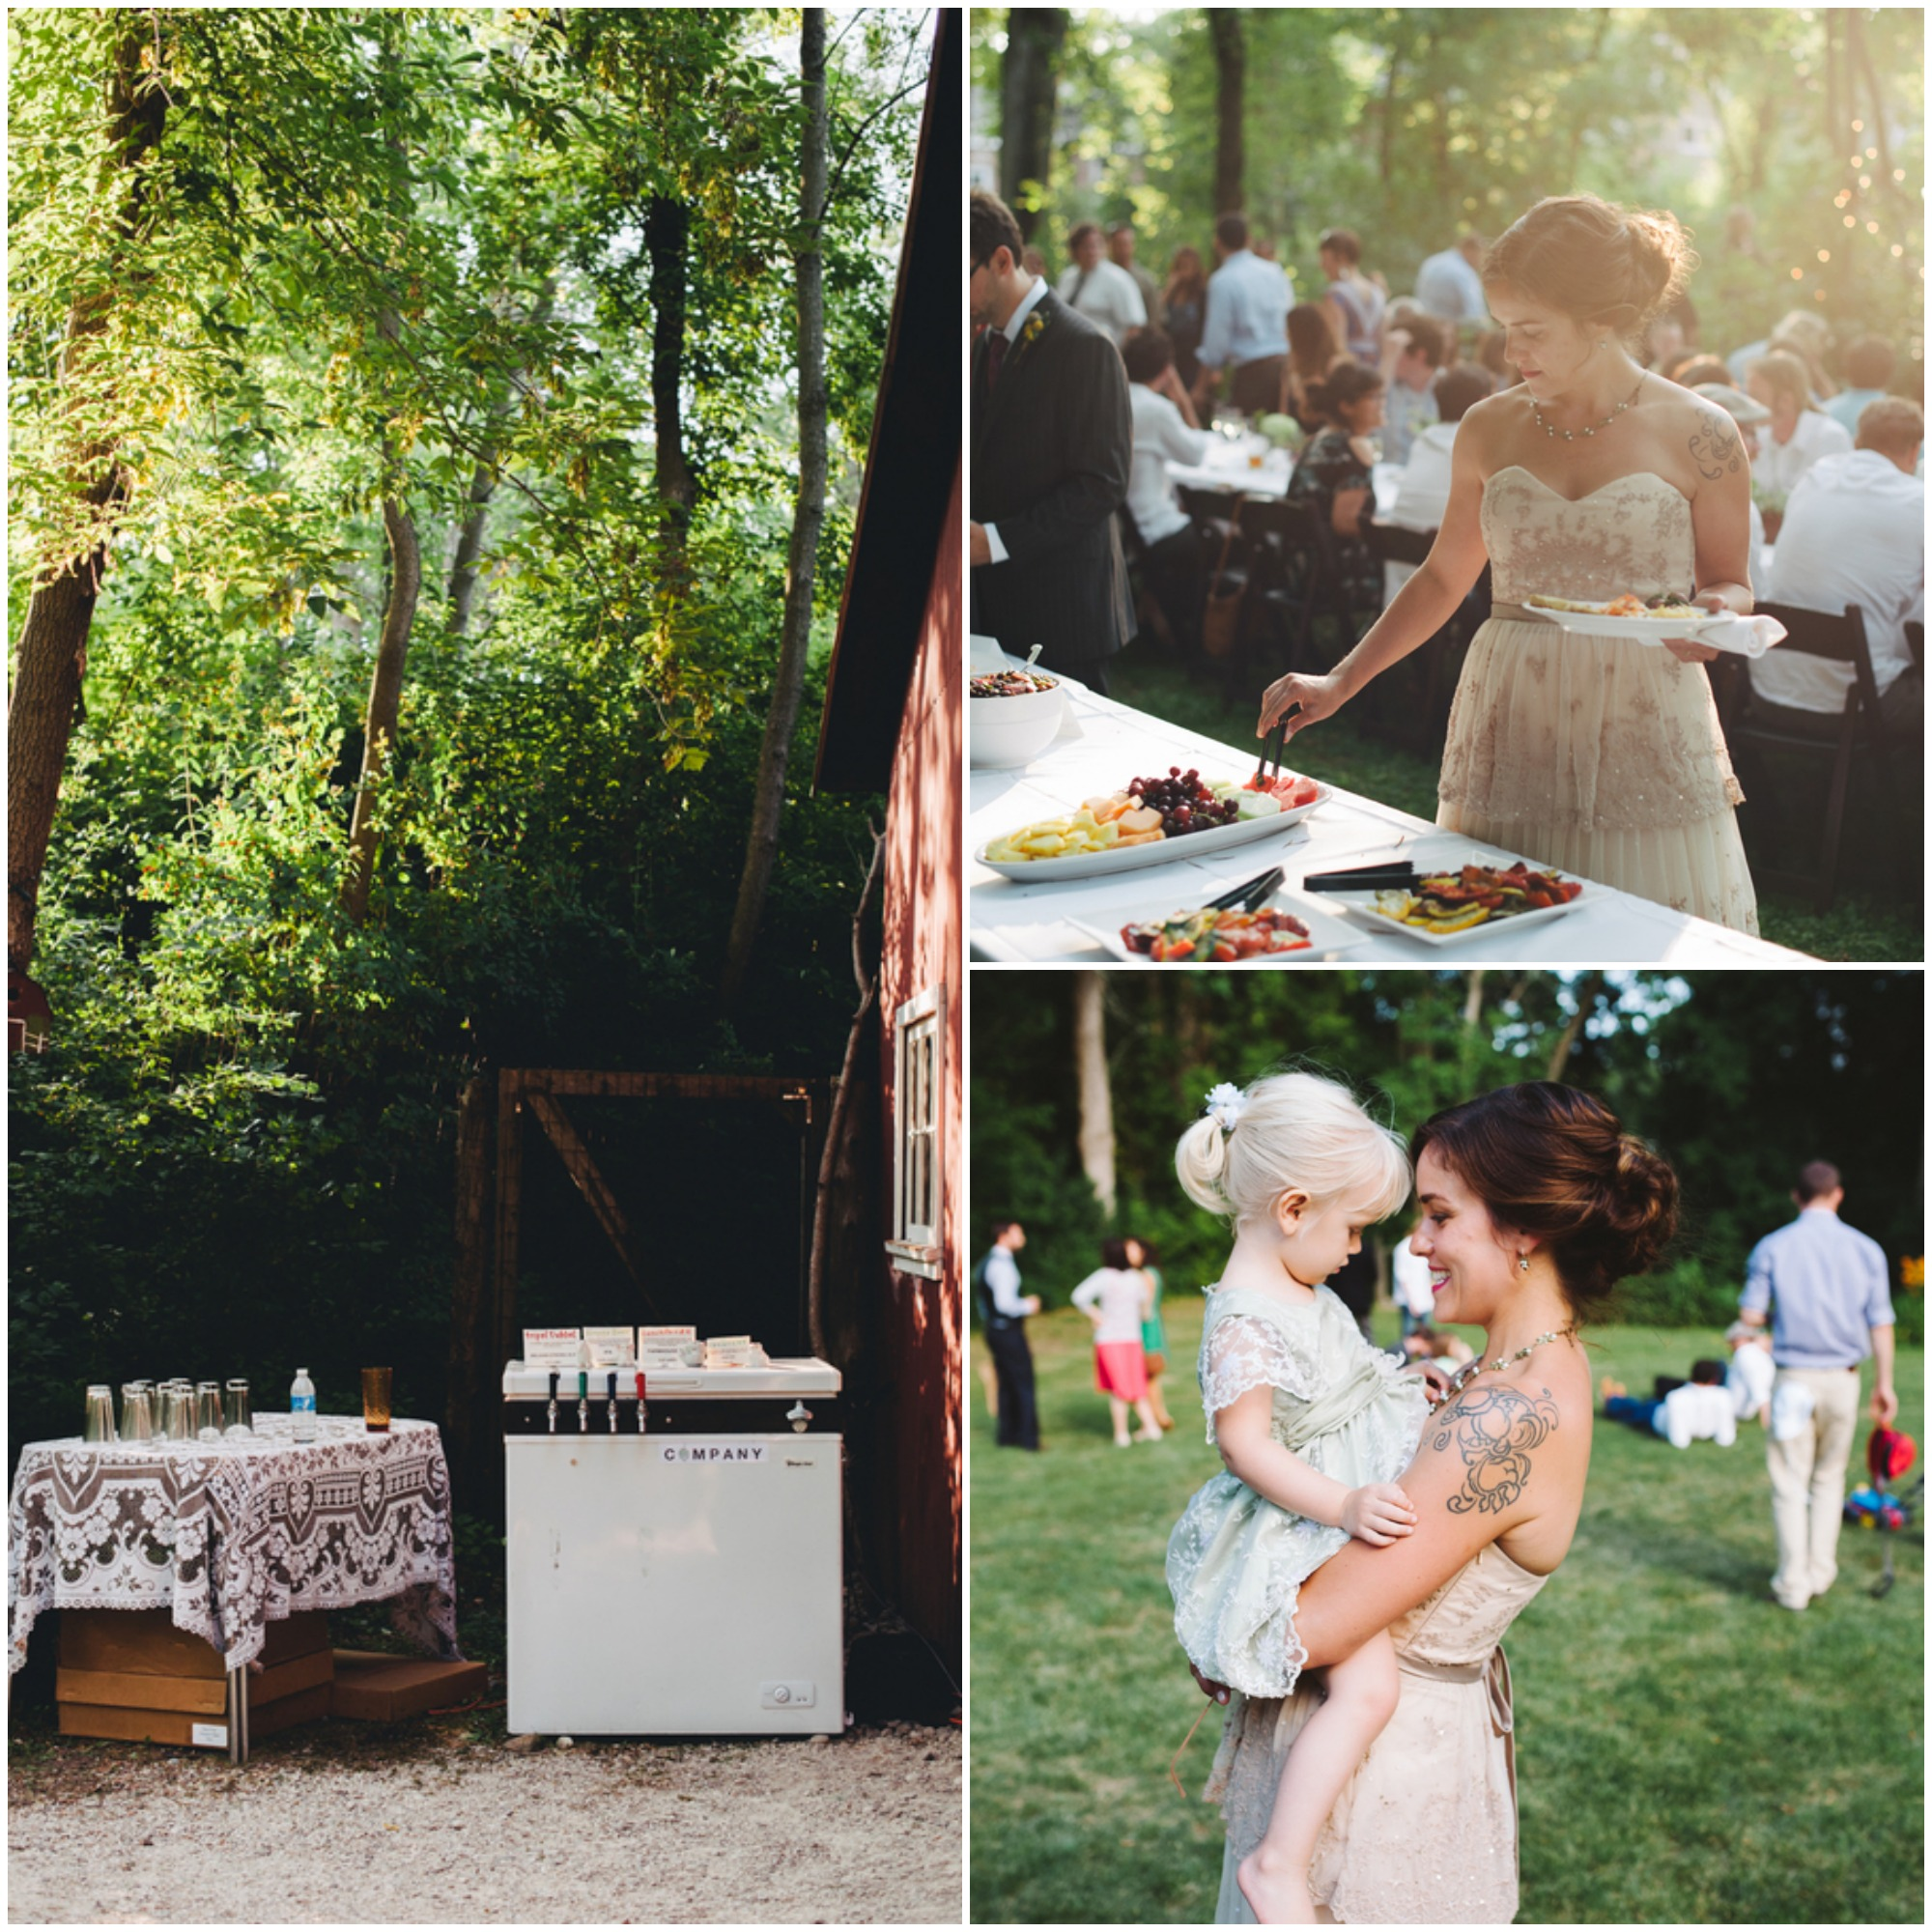 A Vintage Style Backyard Wedding Rustic Wedding Chic